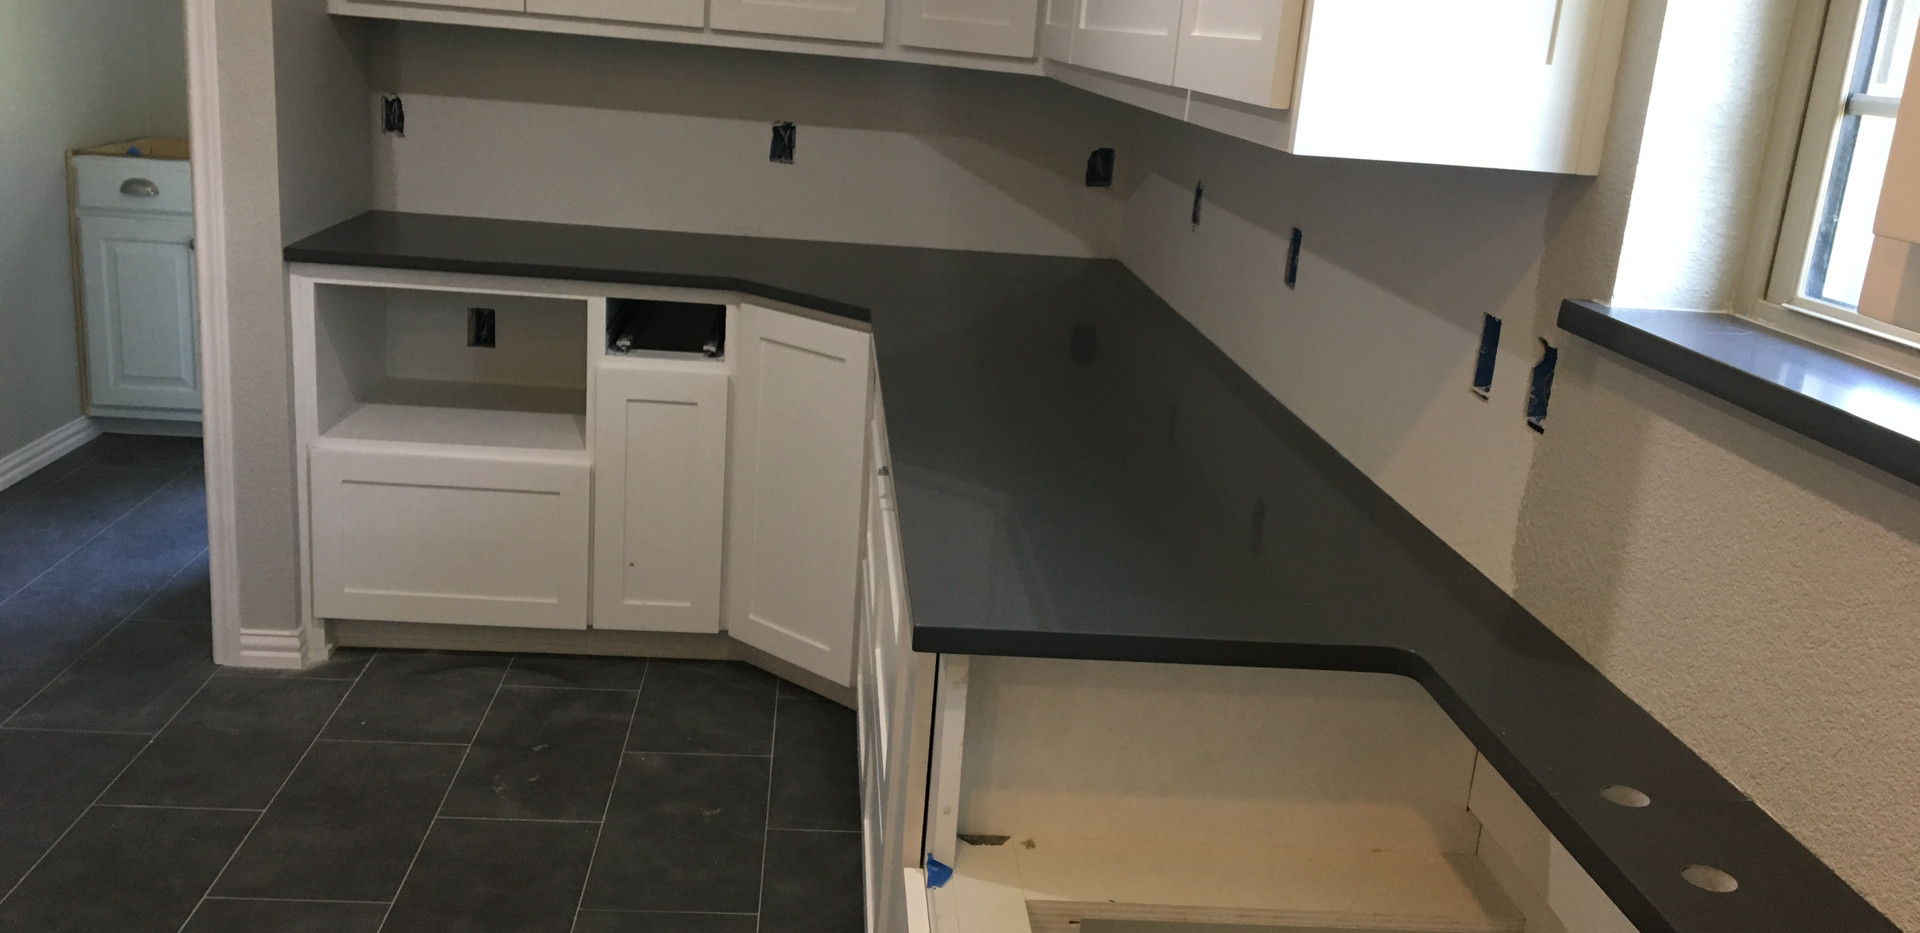 pure_black_quartz_kitchen_countertop_far